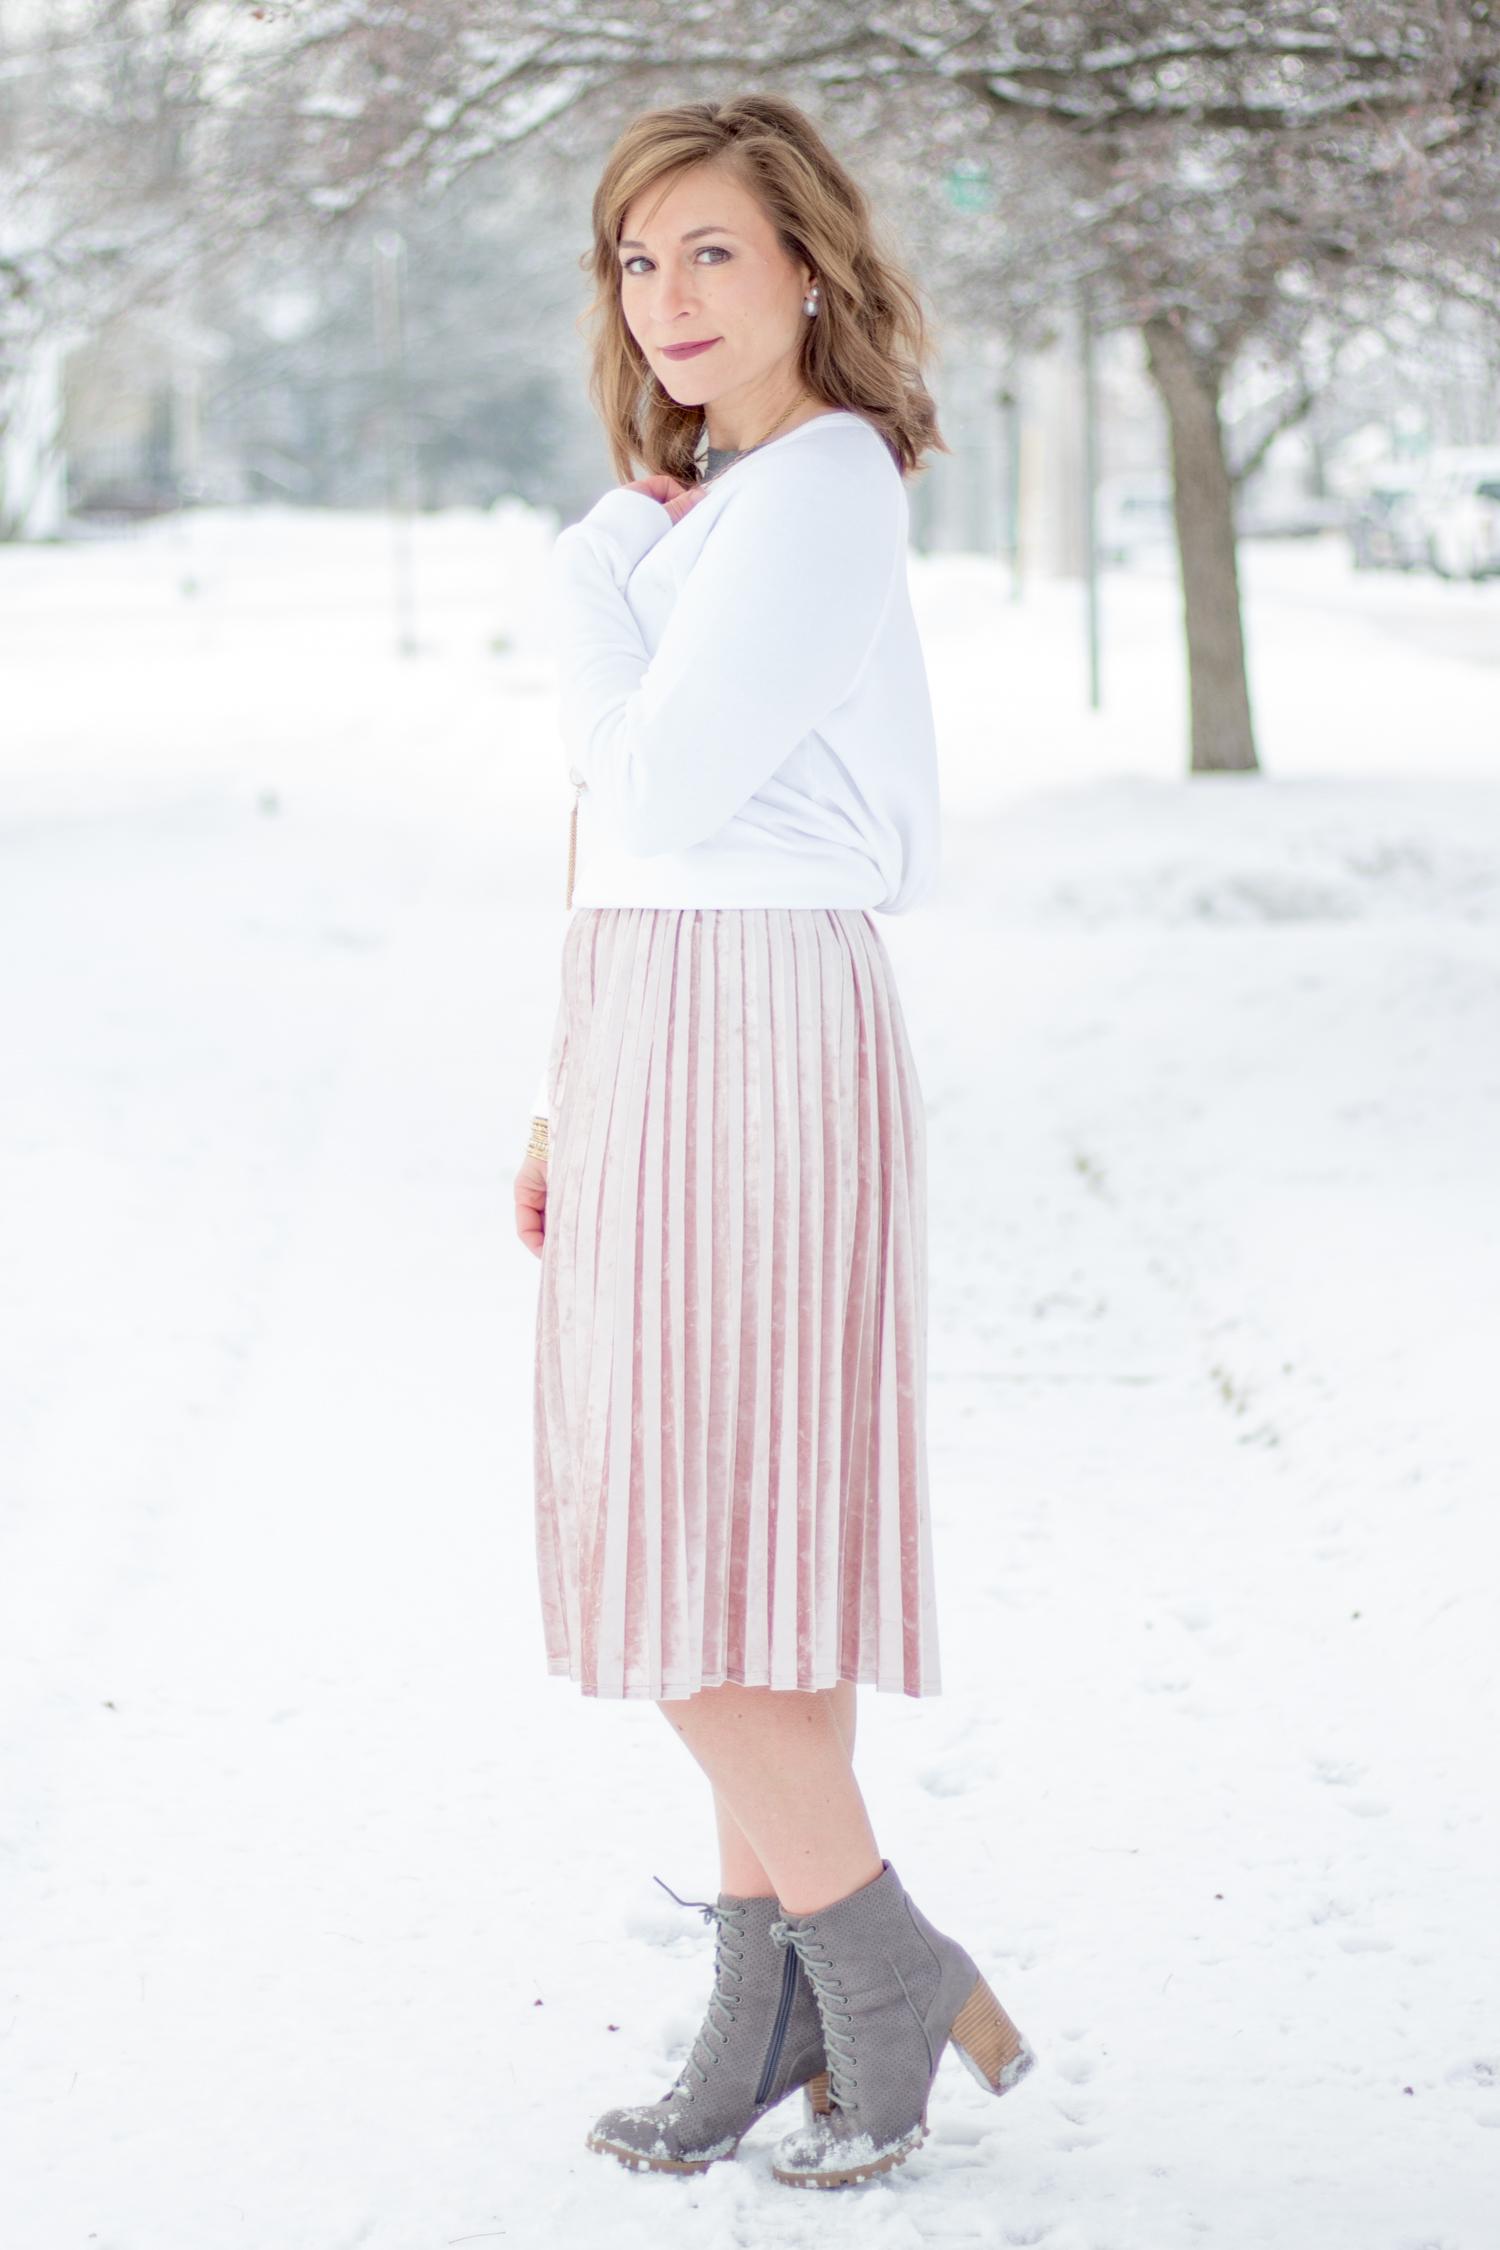 Sweatshirt and Skirt Outfit.jpg